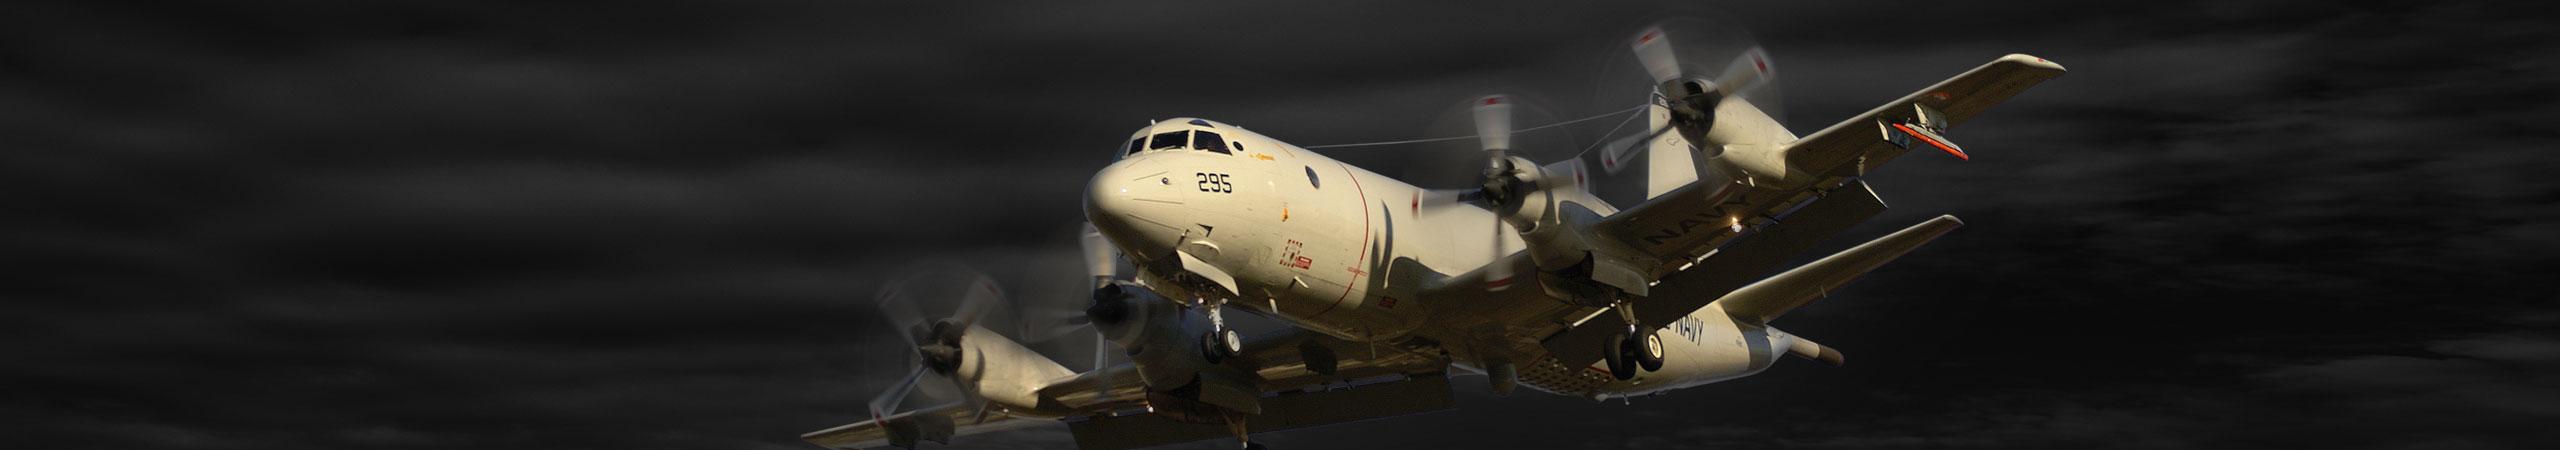 aircrafts_Banner